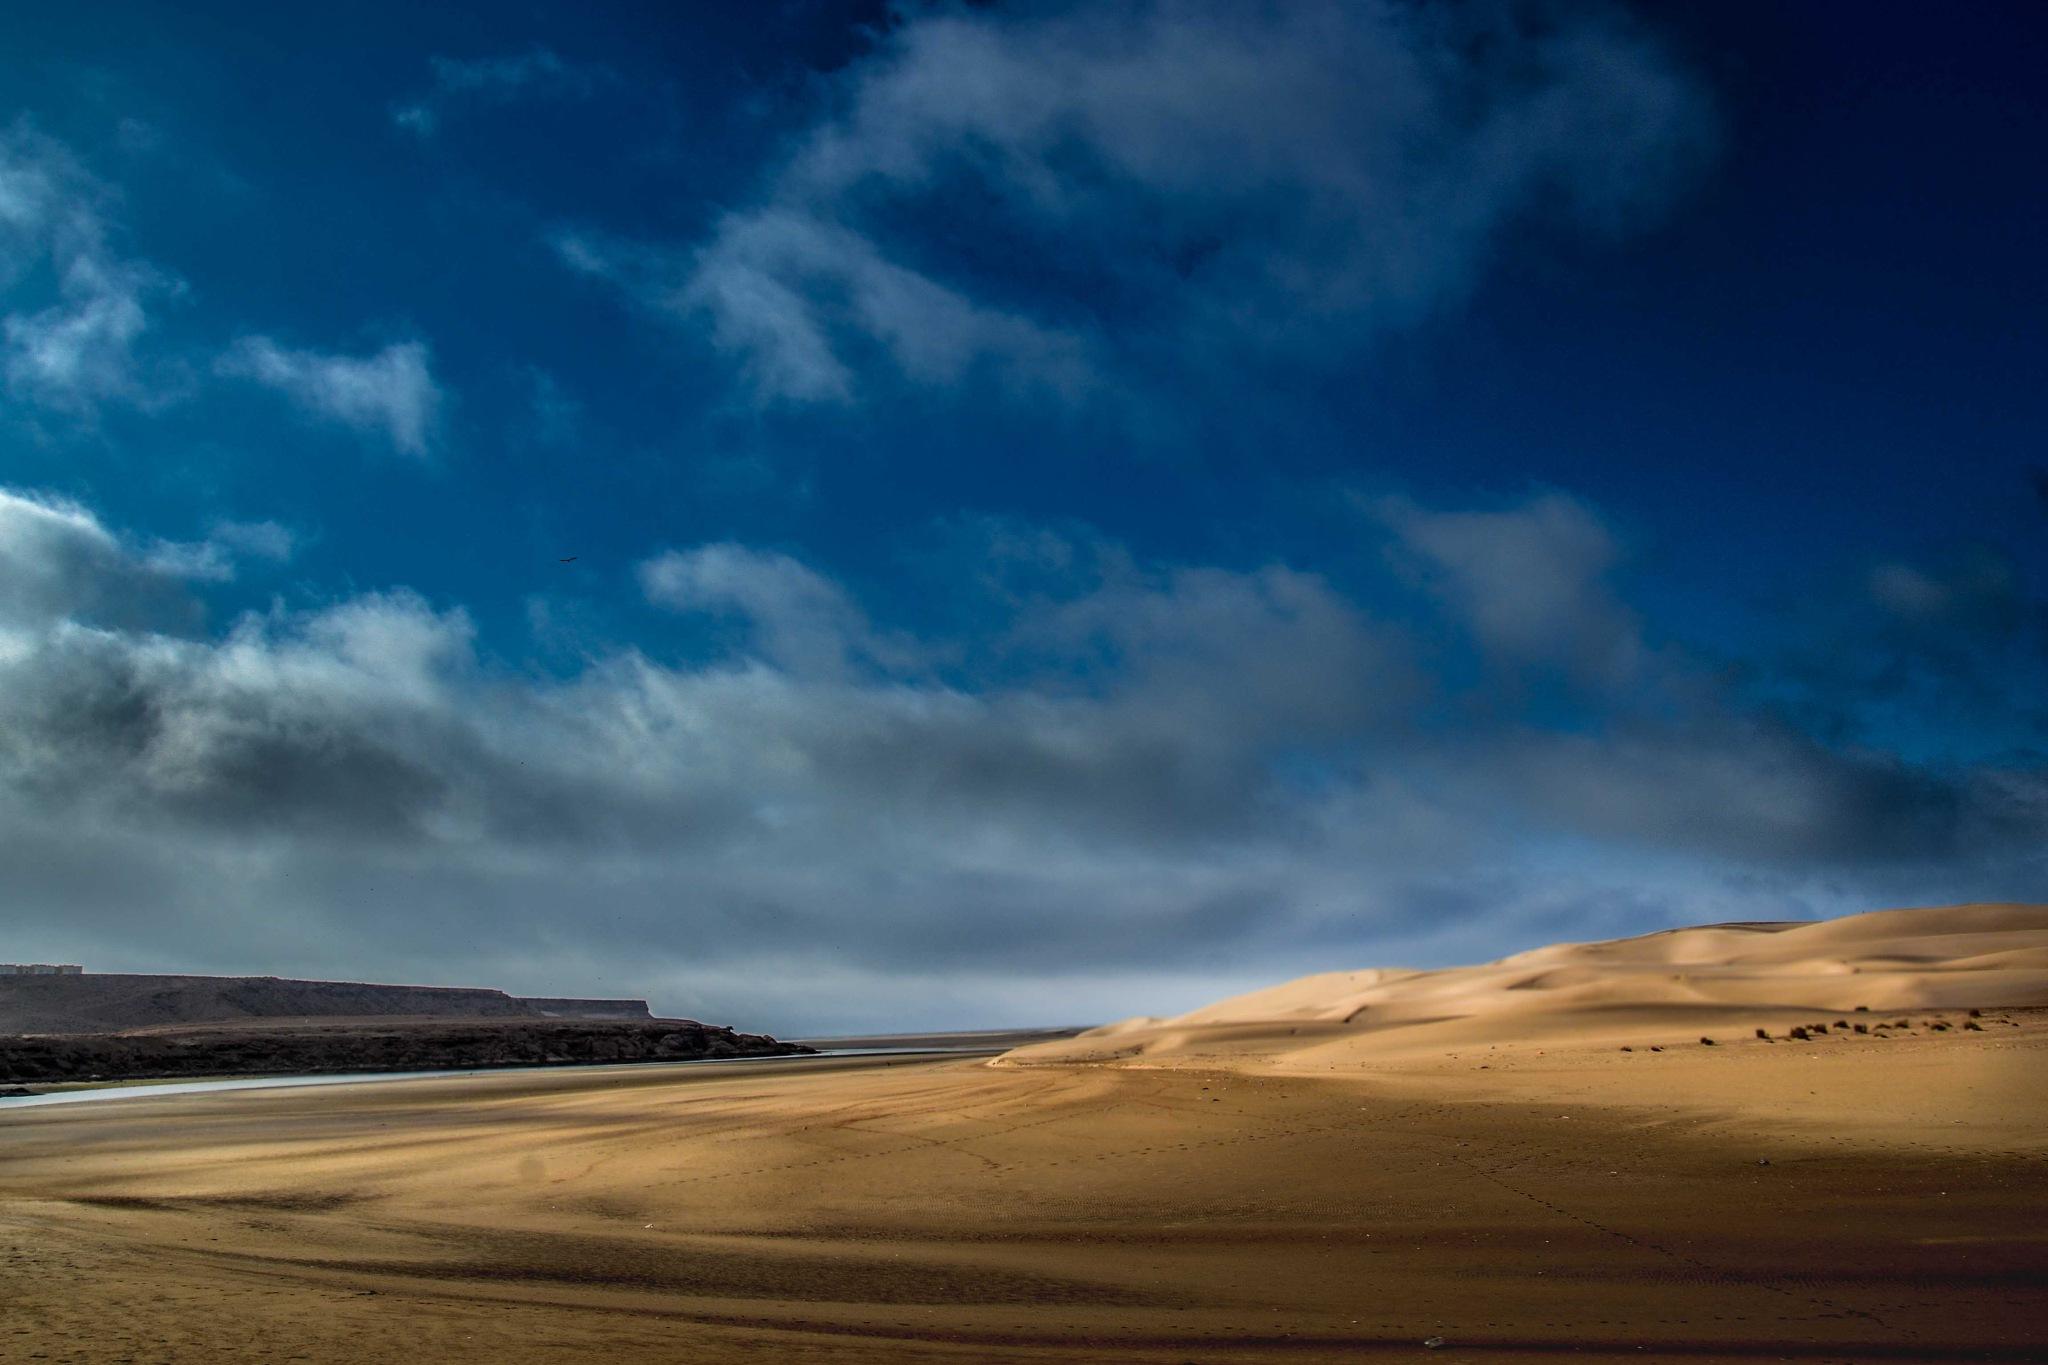 #desert by Mohcine Rabhi